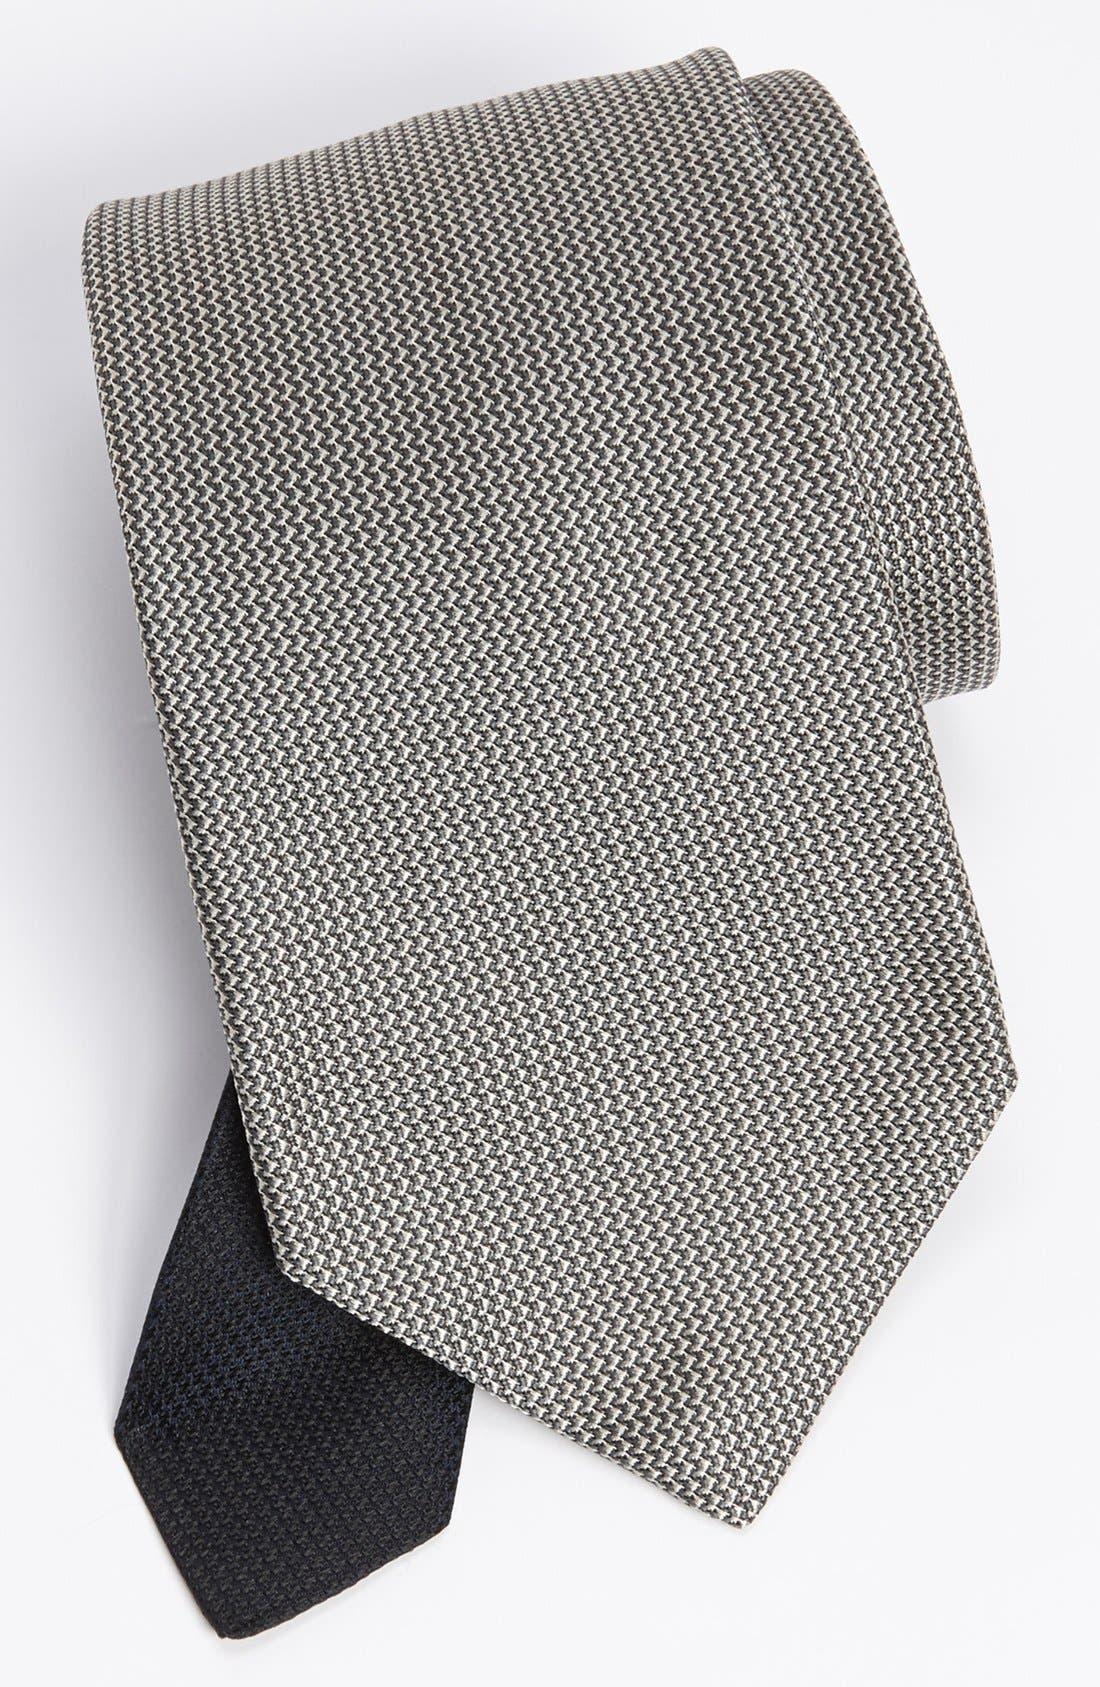 Alternate Image 1 Selected - John W. Nordstrom® Woven Silk Tie (Tall)